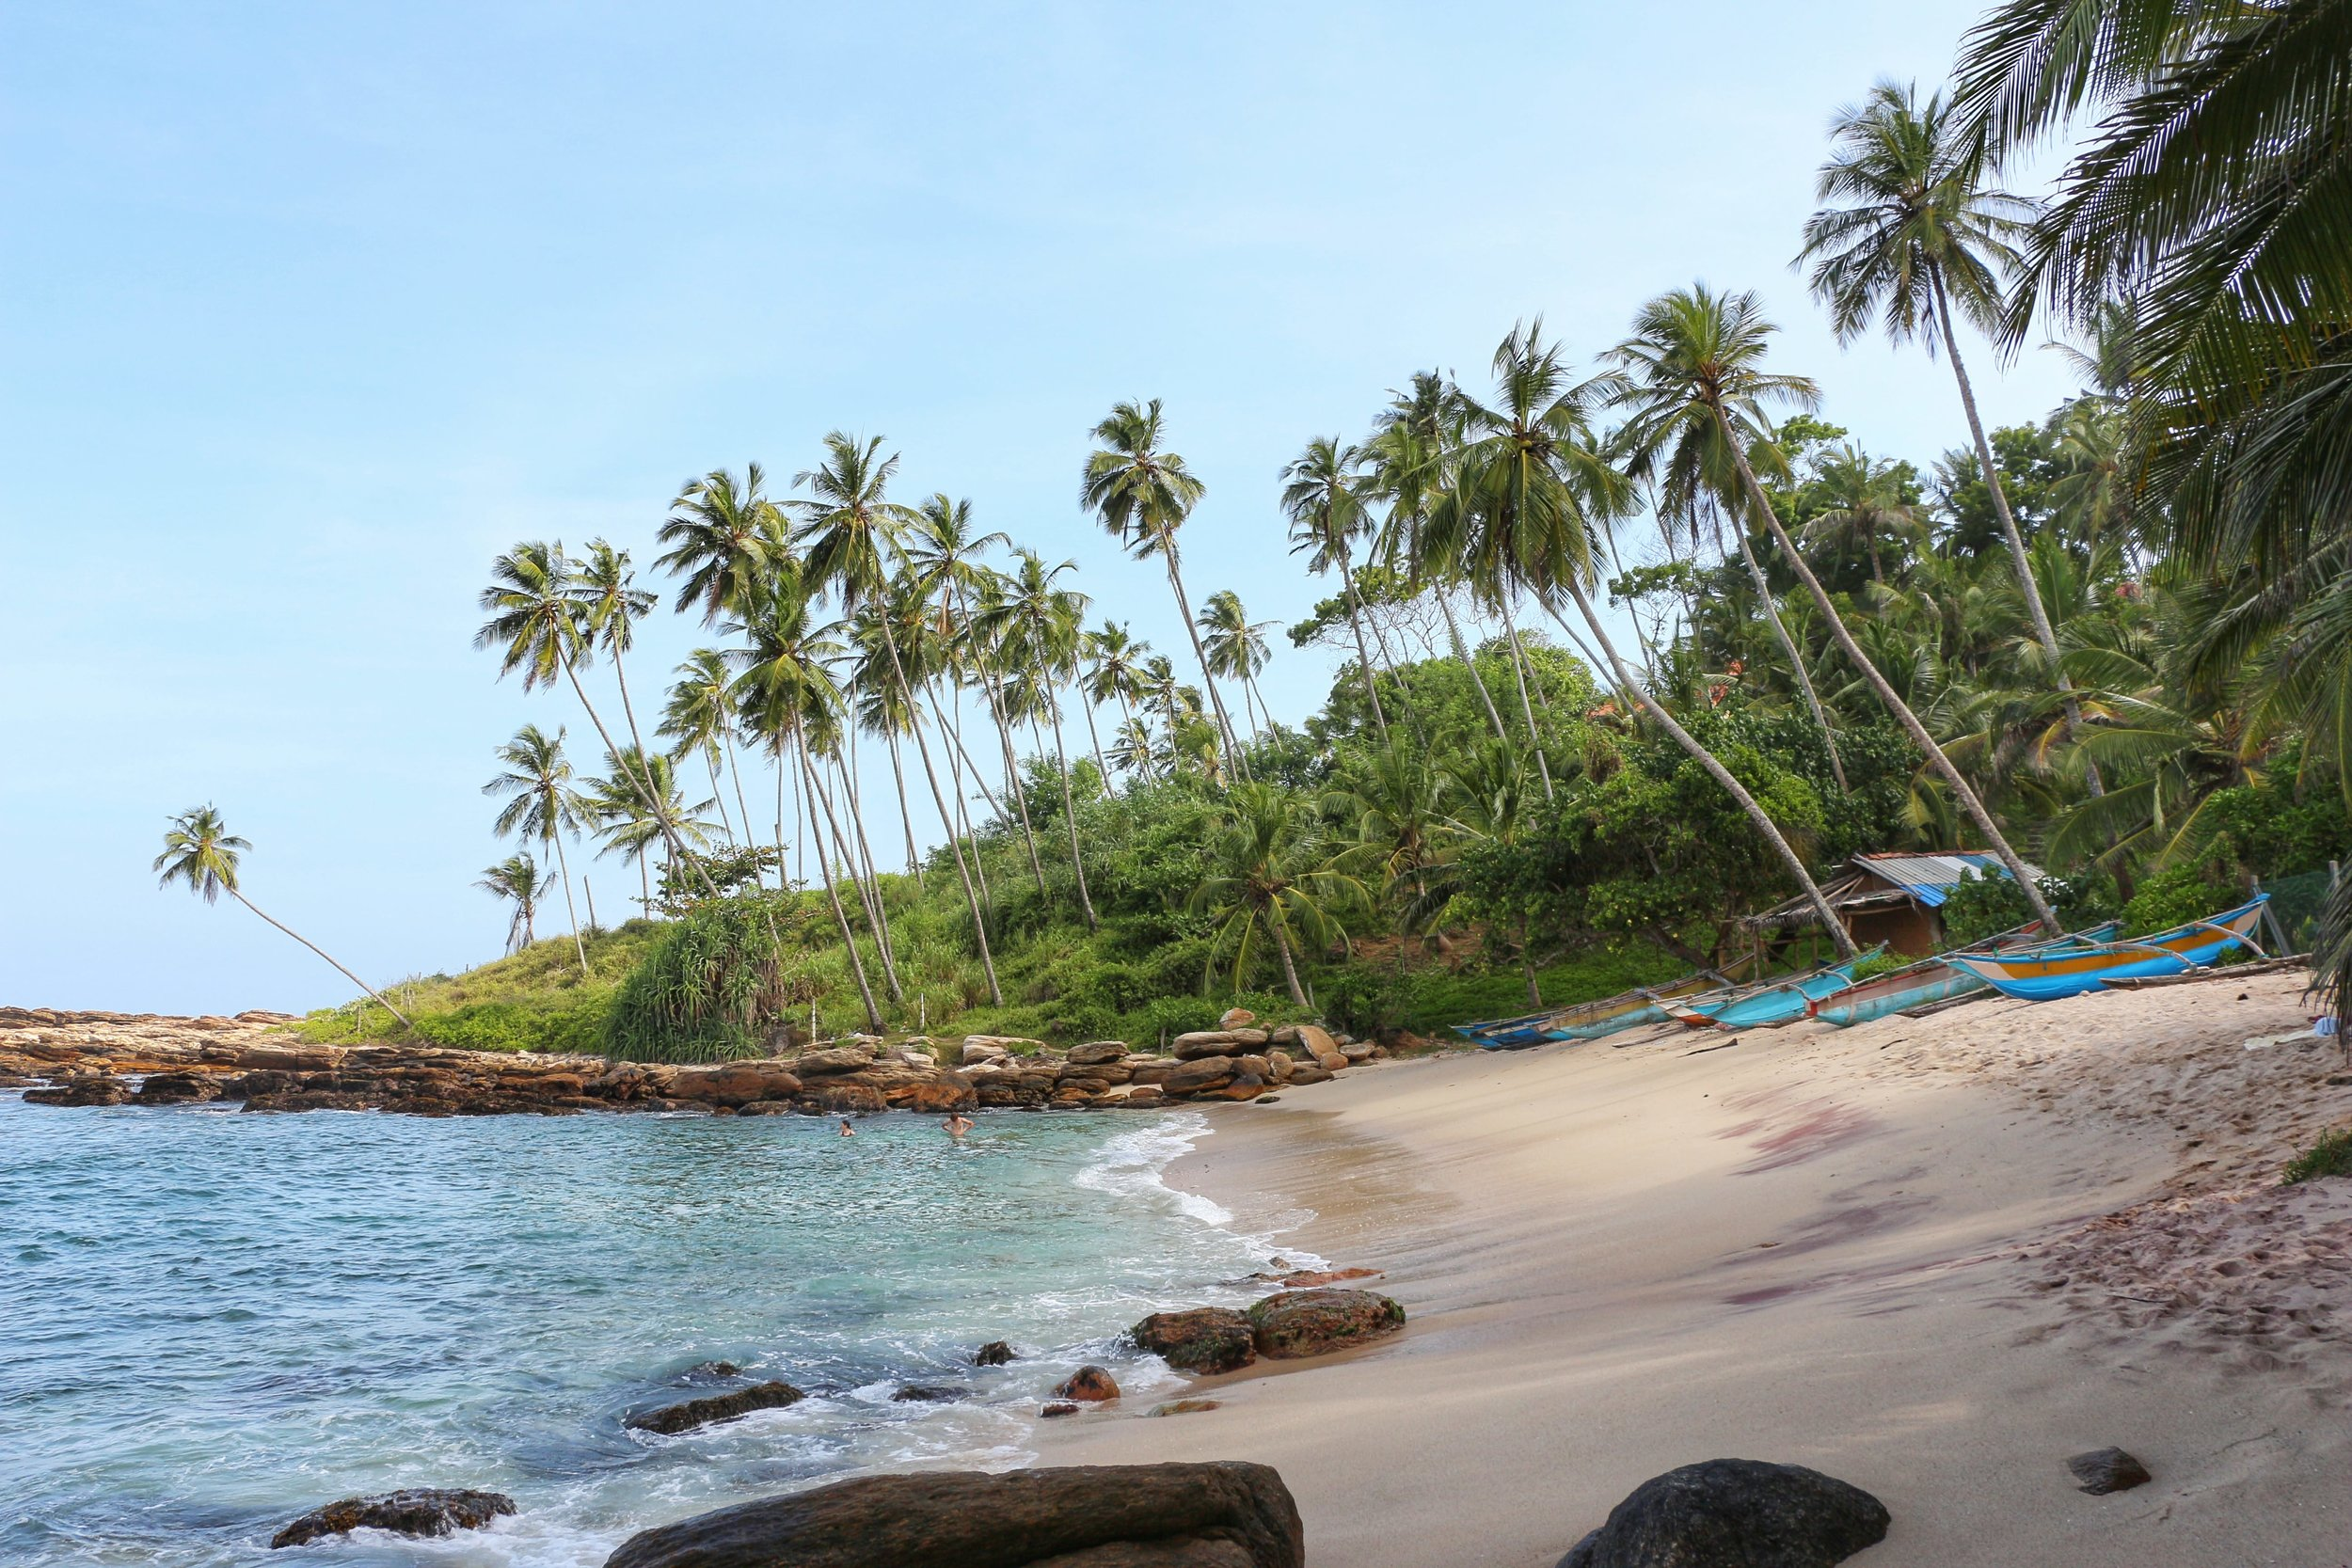 Goyambokka Beach is one of the most beautiful Sri Lanka beaches.